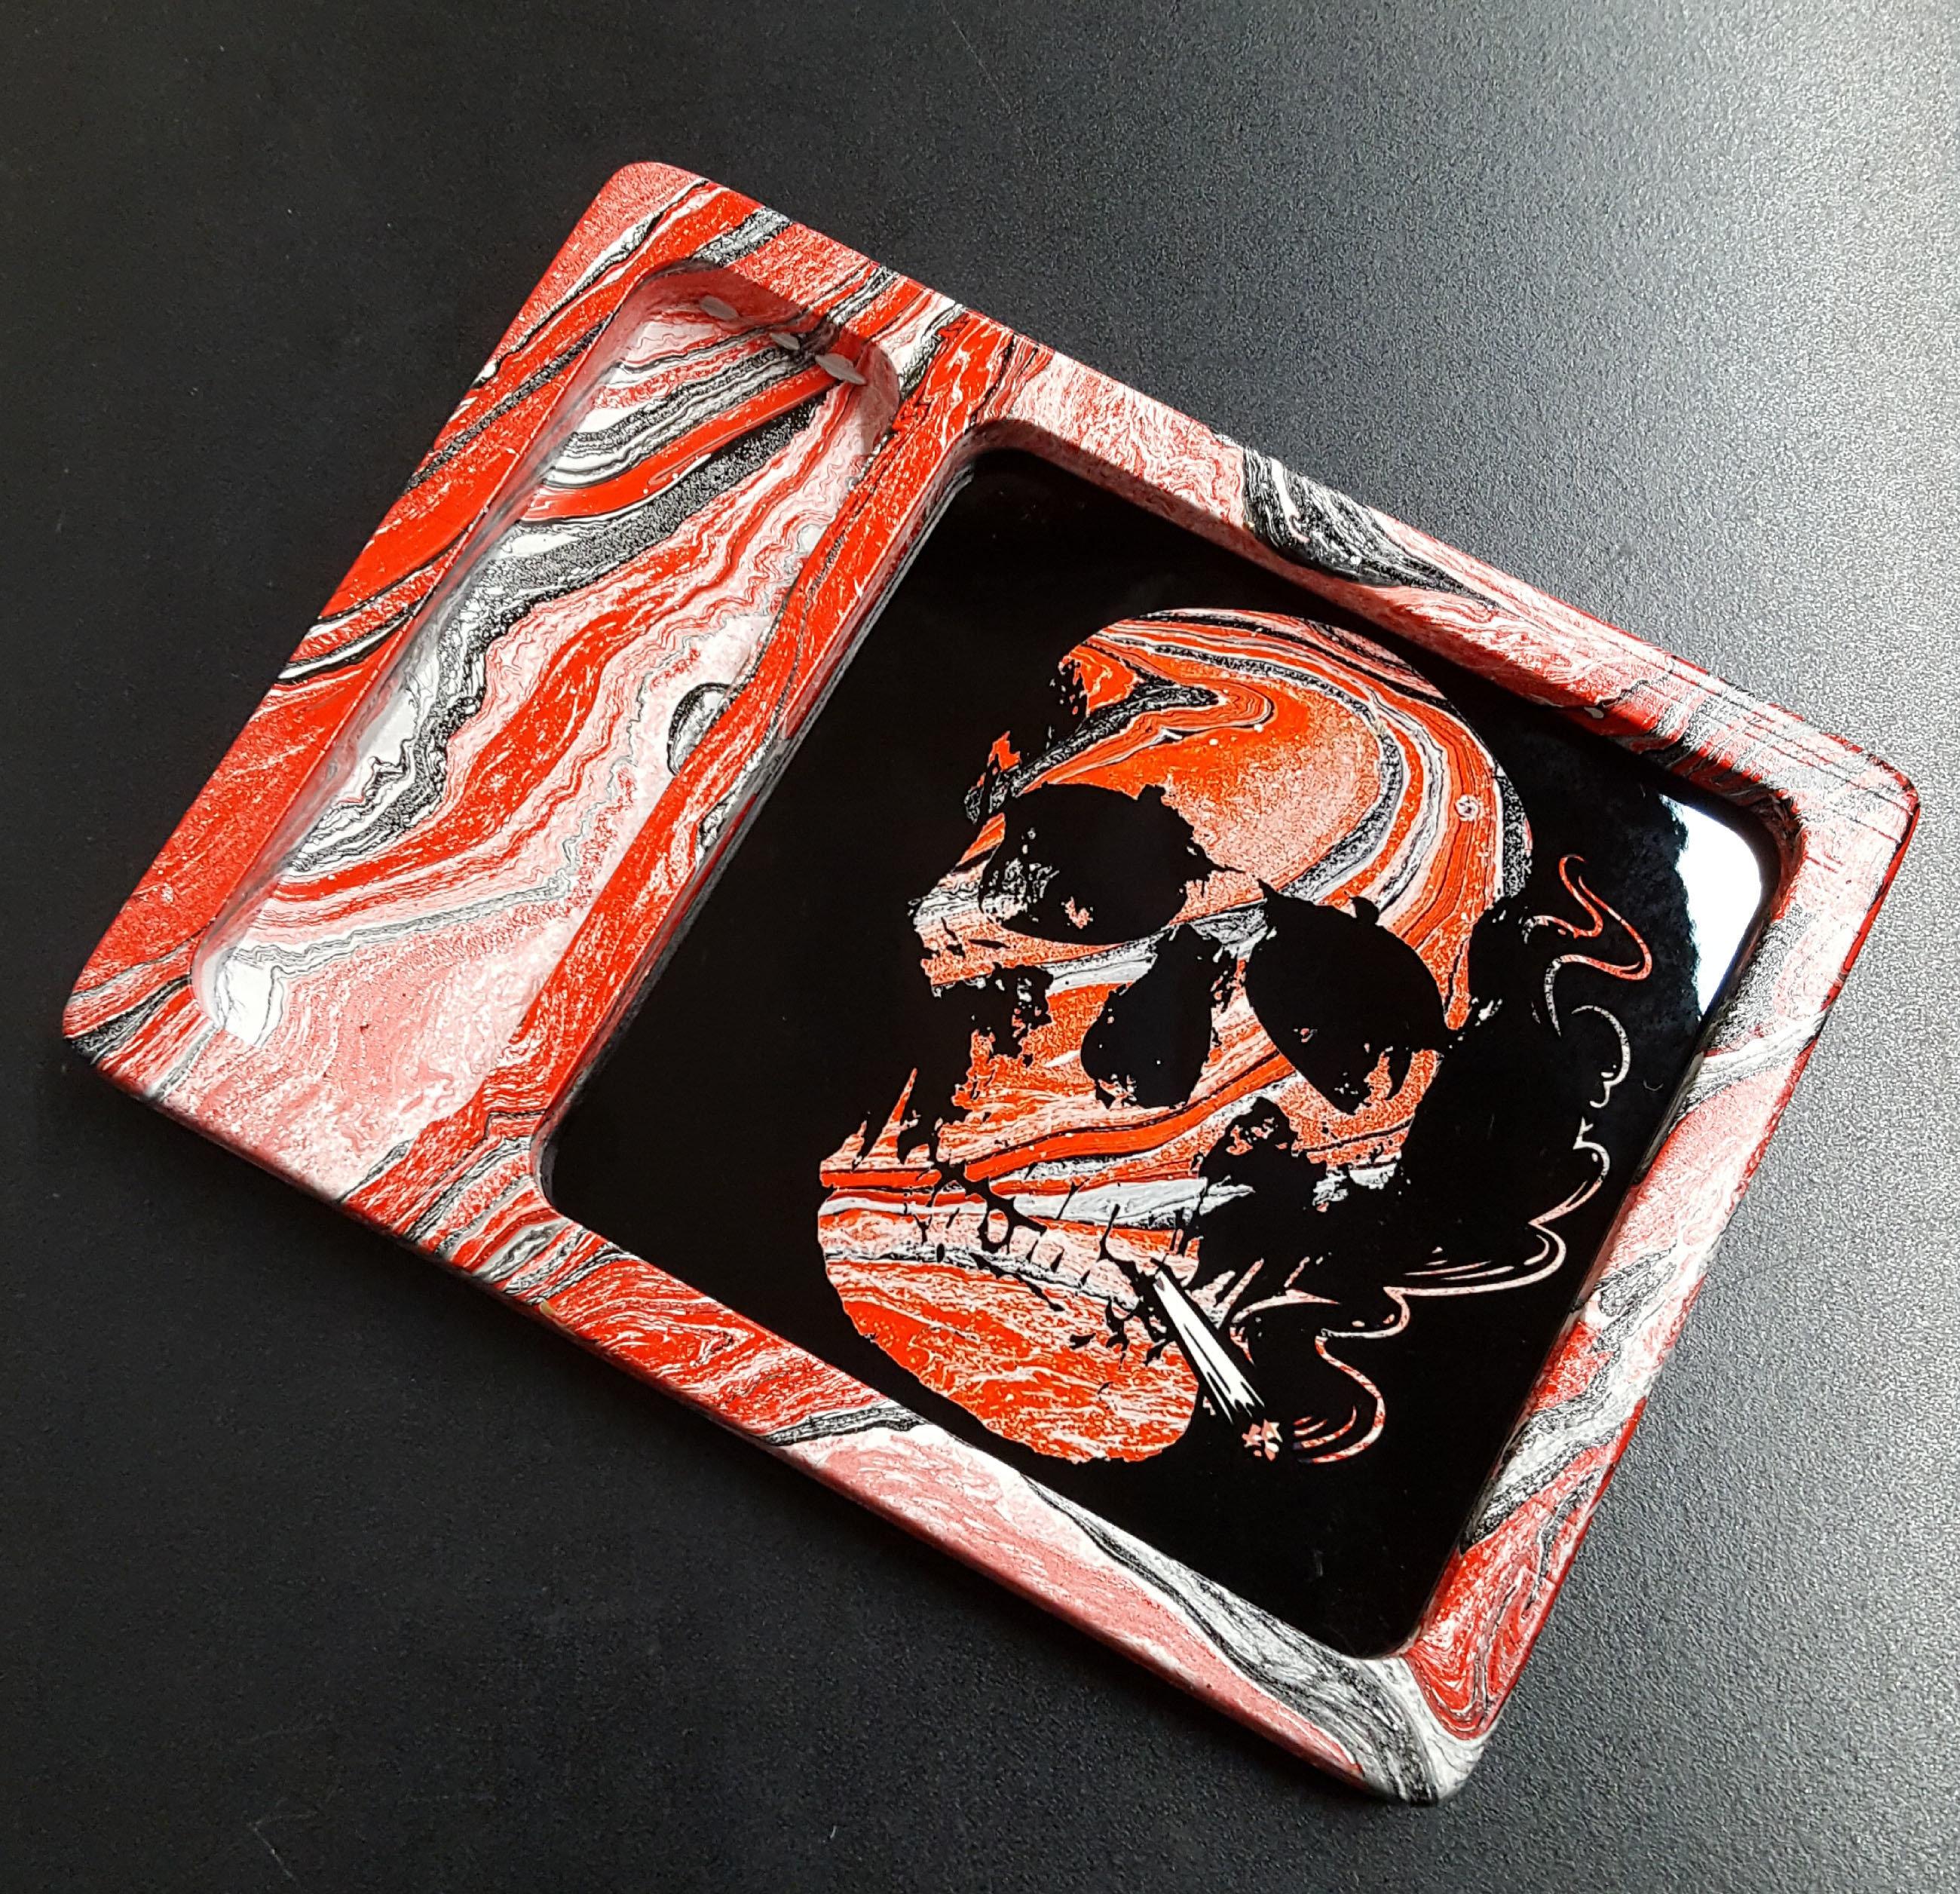 Red/black Hydro Swirl Skull 8x6x1 SCRATCH RESISTANT PAINT!